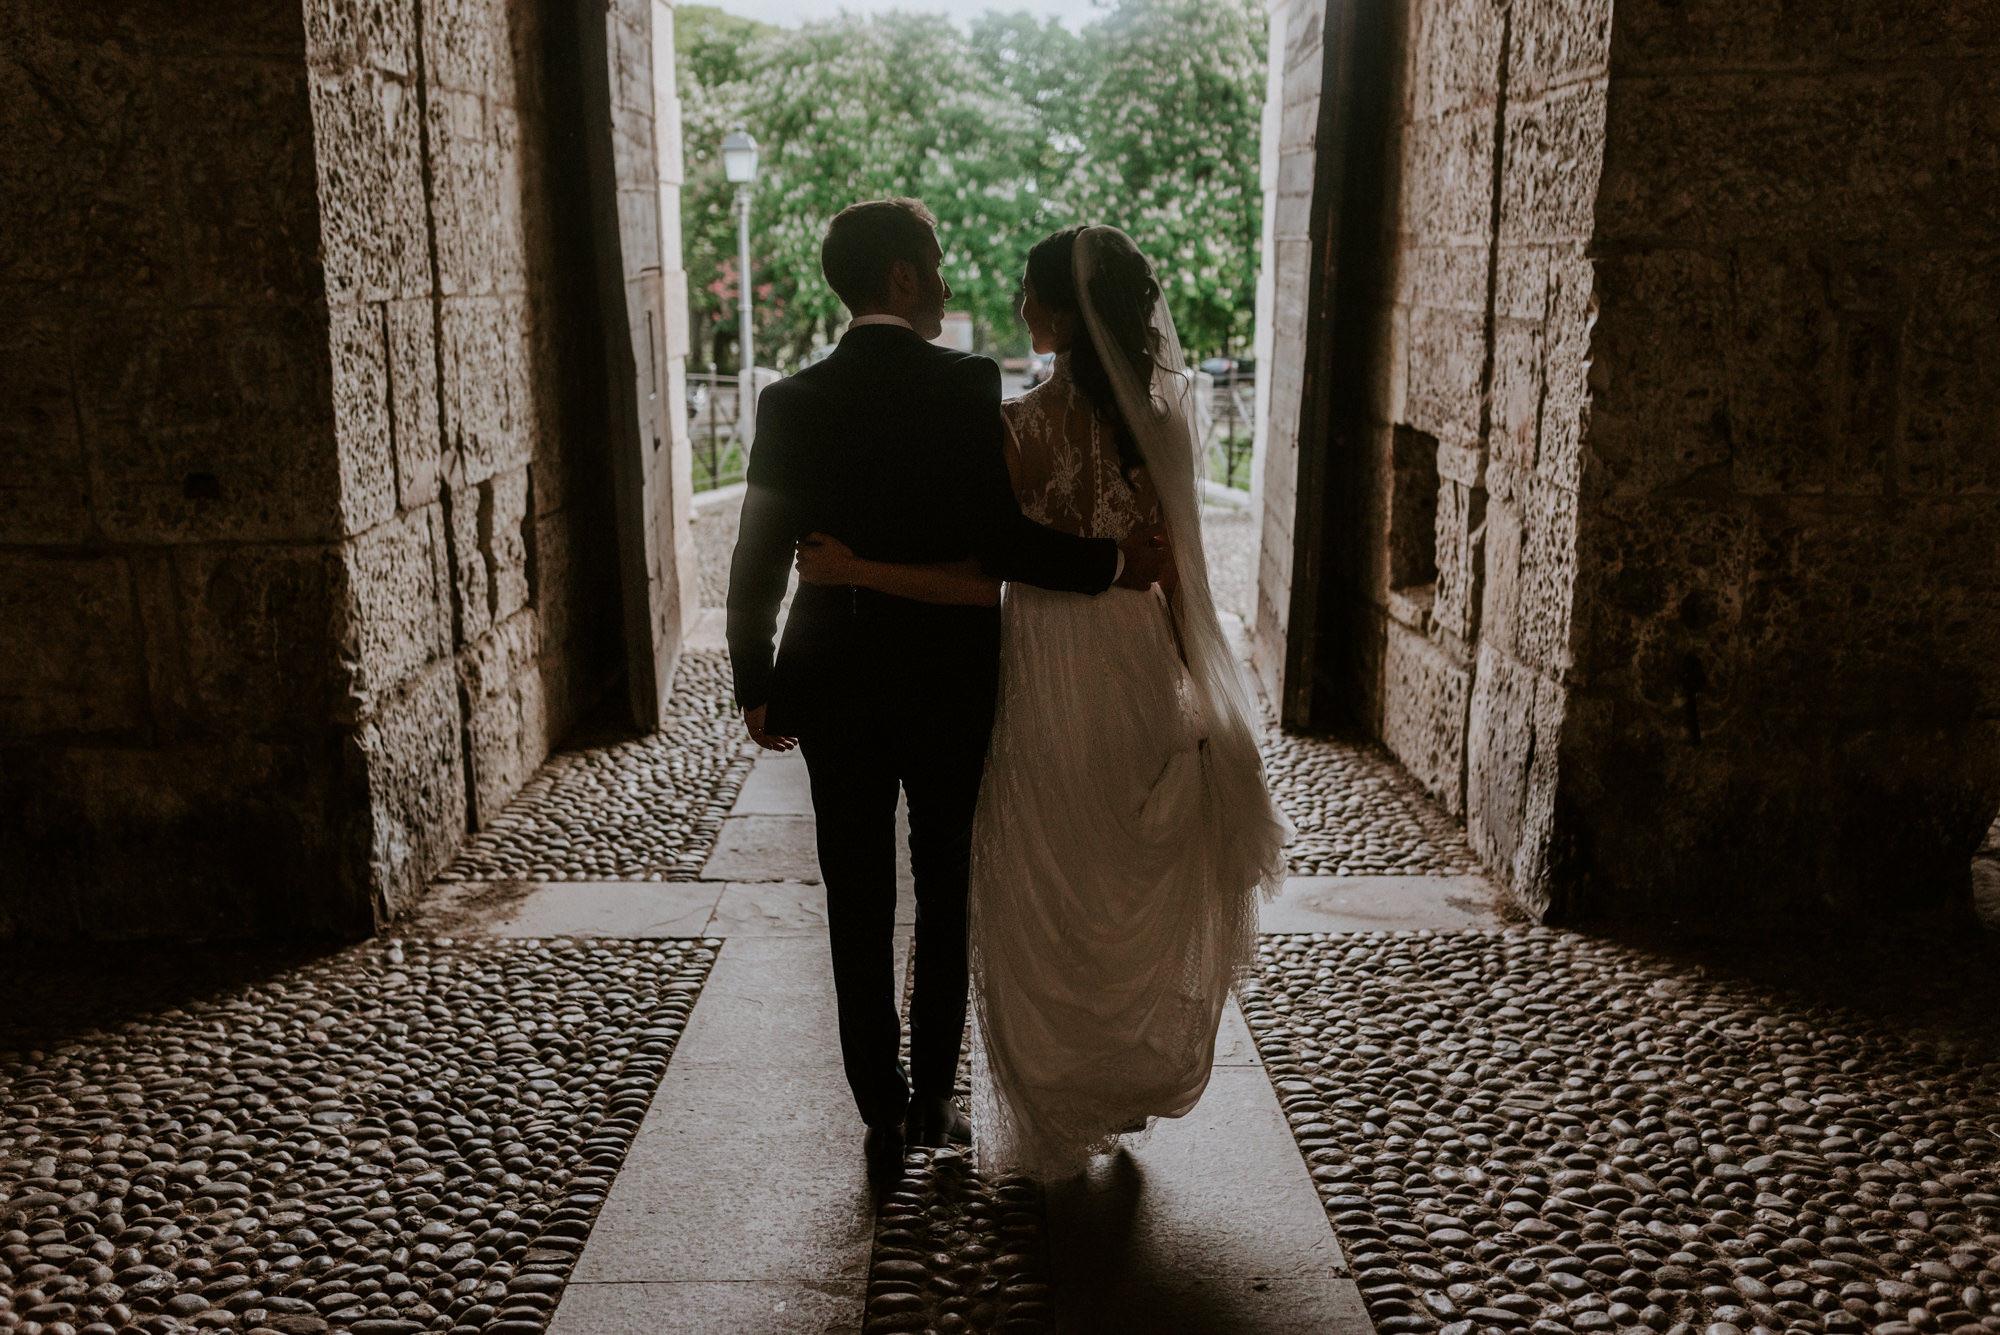 FOTO+PHOTO+BODA+WEDDING+ITALIA+ITALY+MAURICIO+GARAY+MAURICIOGARAY+WEDDINPHOTOGRAPHER+FOTOGRAFODEBODA-1313.jpg